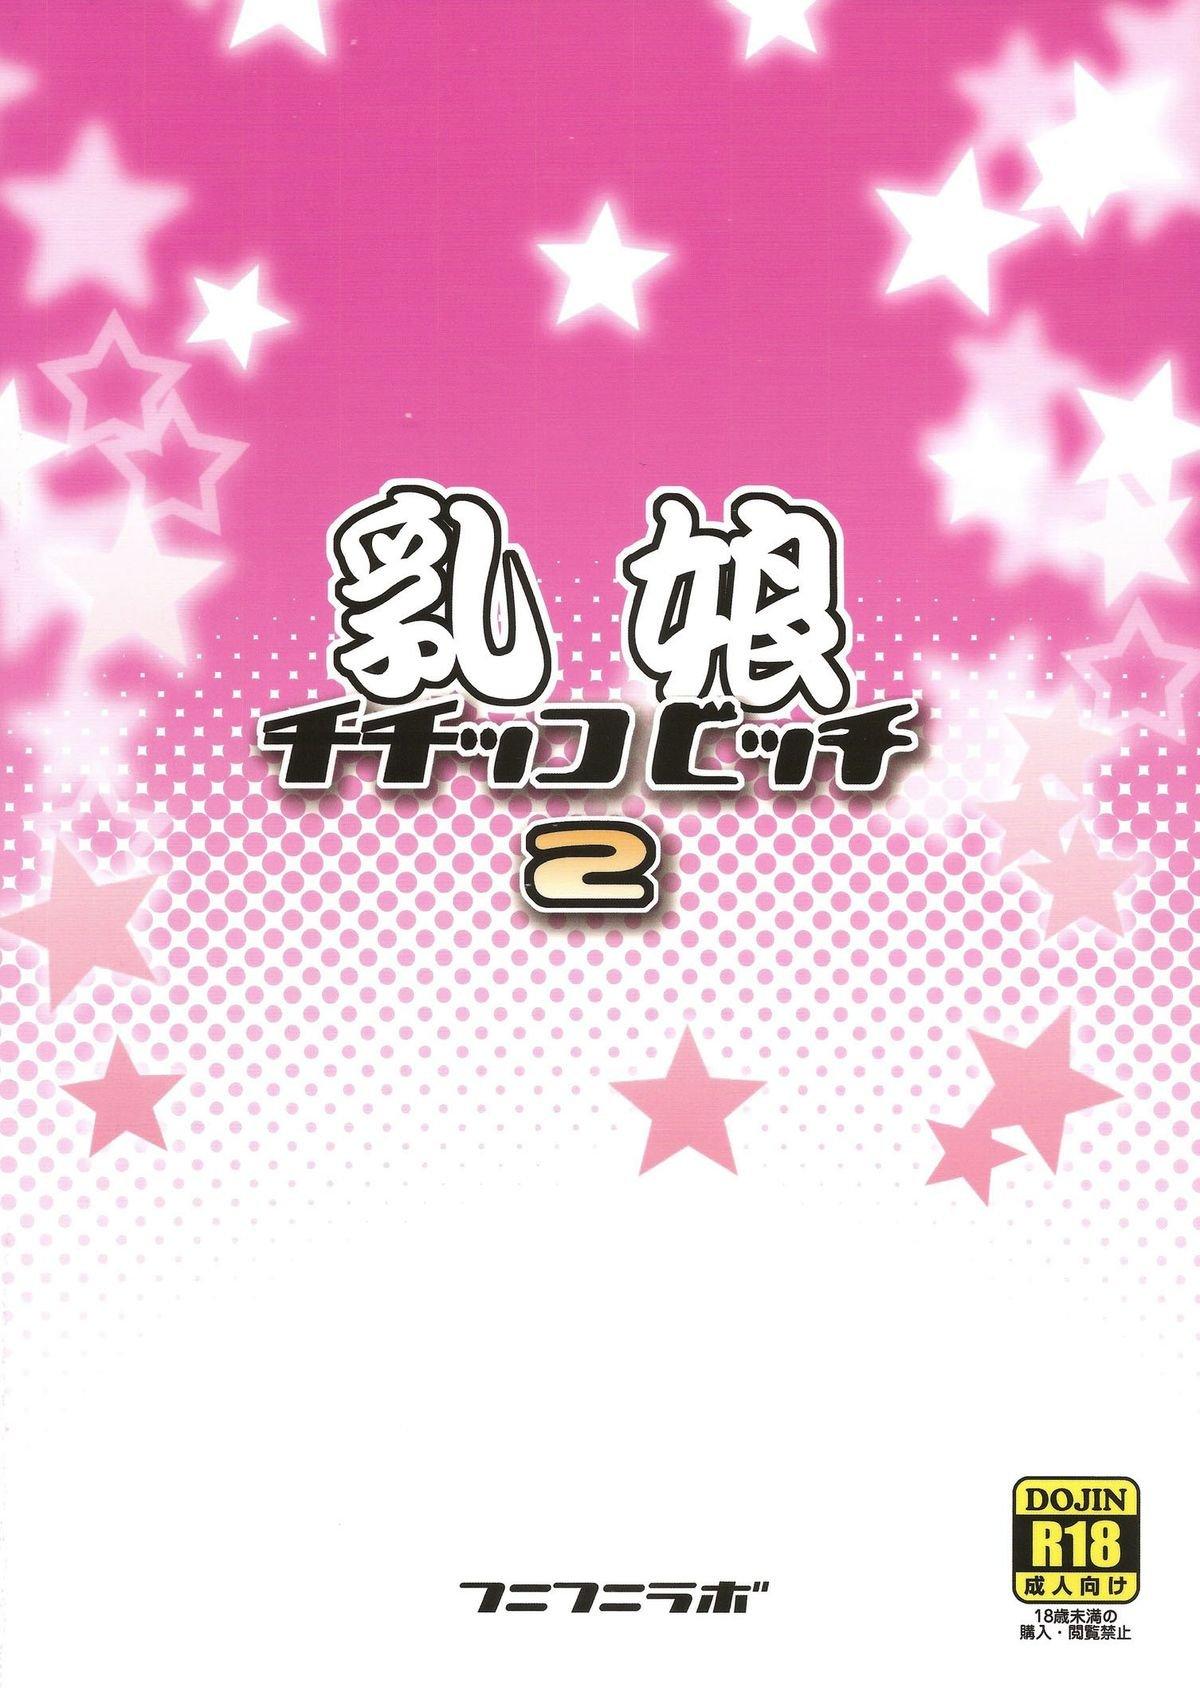 Funi Funi Lab (Tamagoro) Chichikko Bitch 2 (Fairy Tail